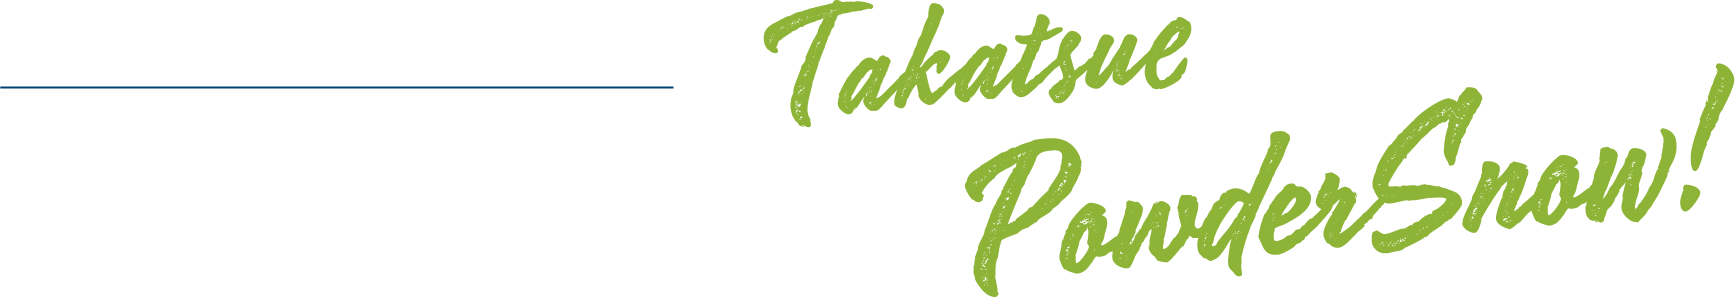 Takatsue PowderSnow